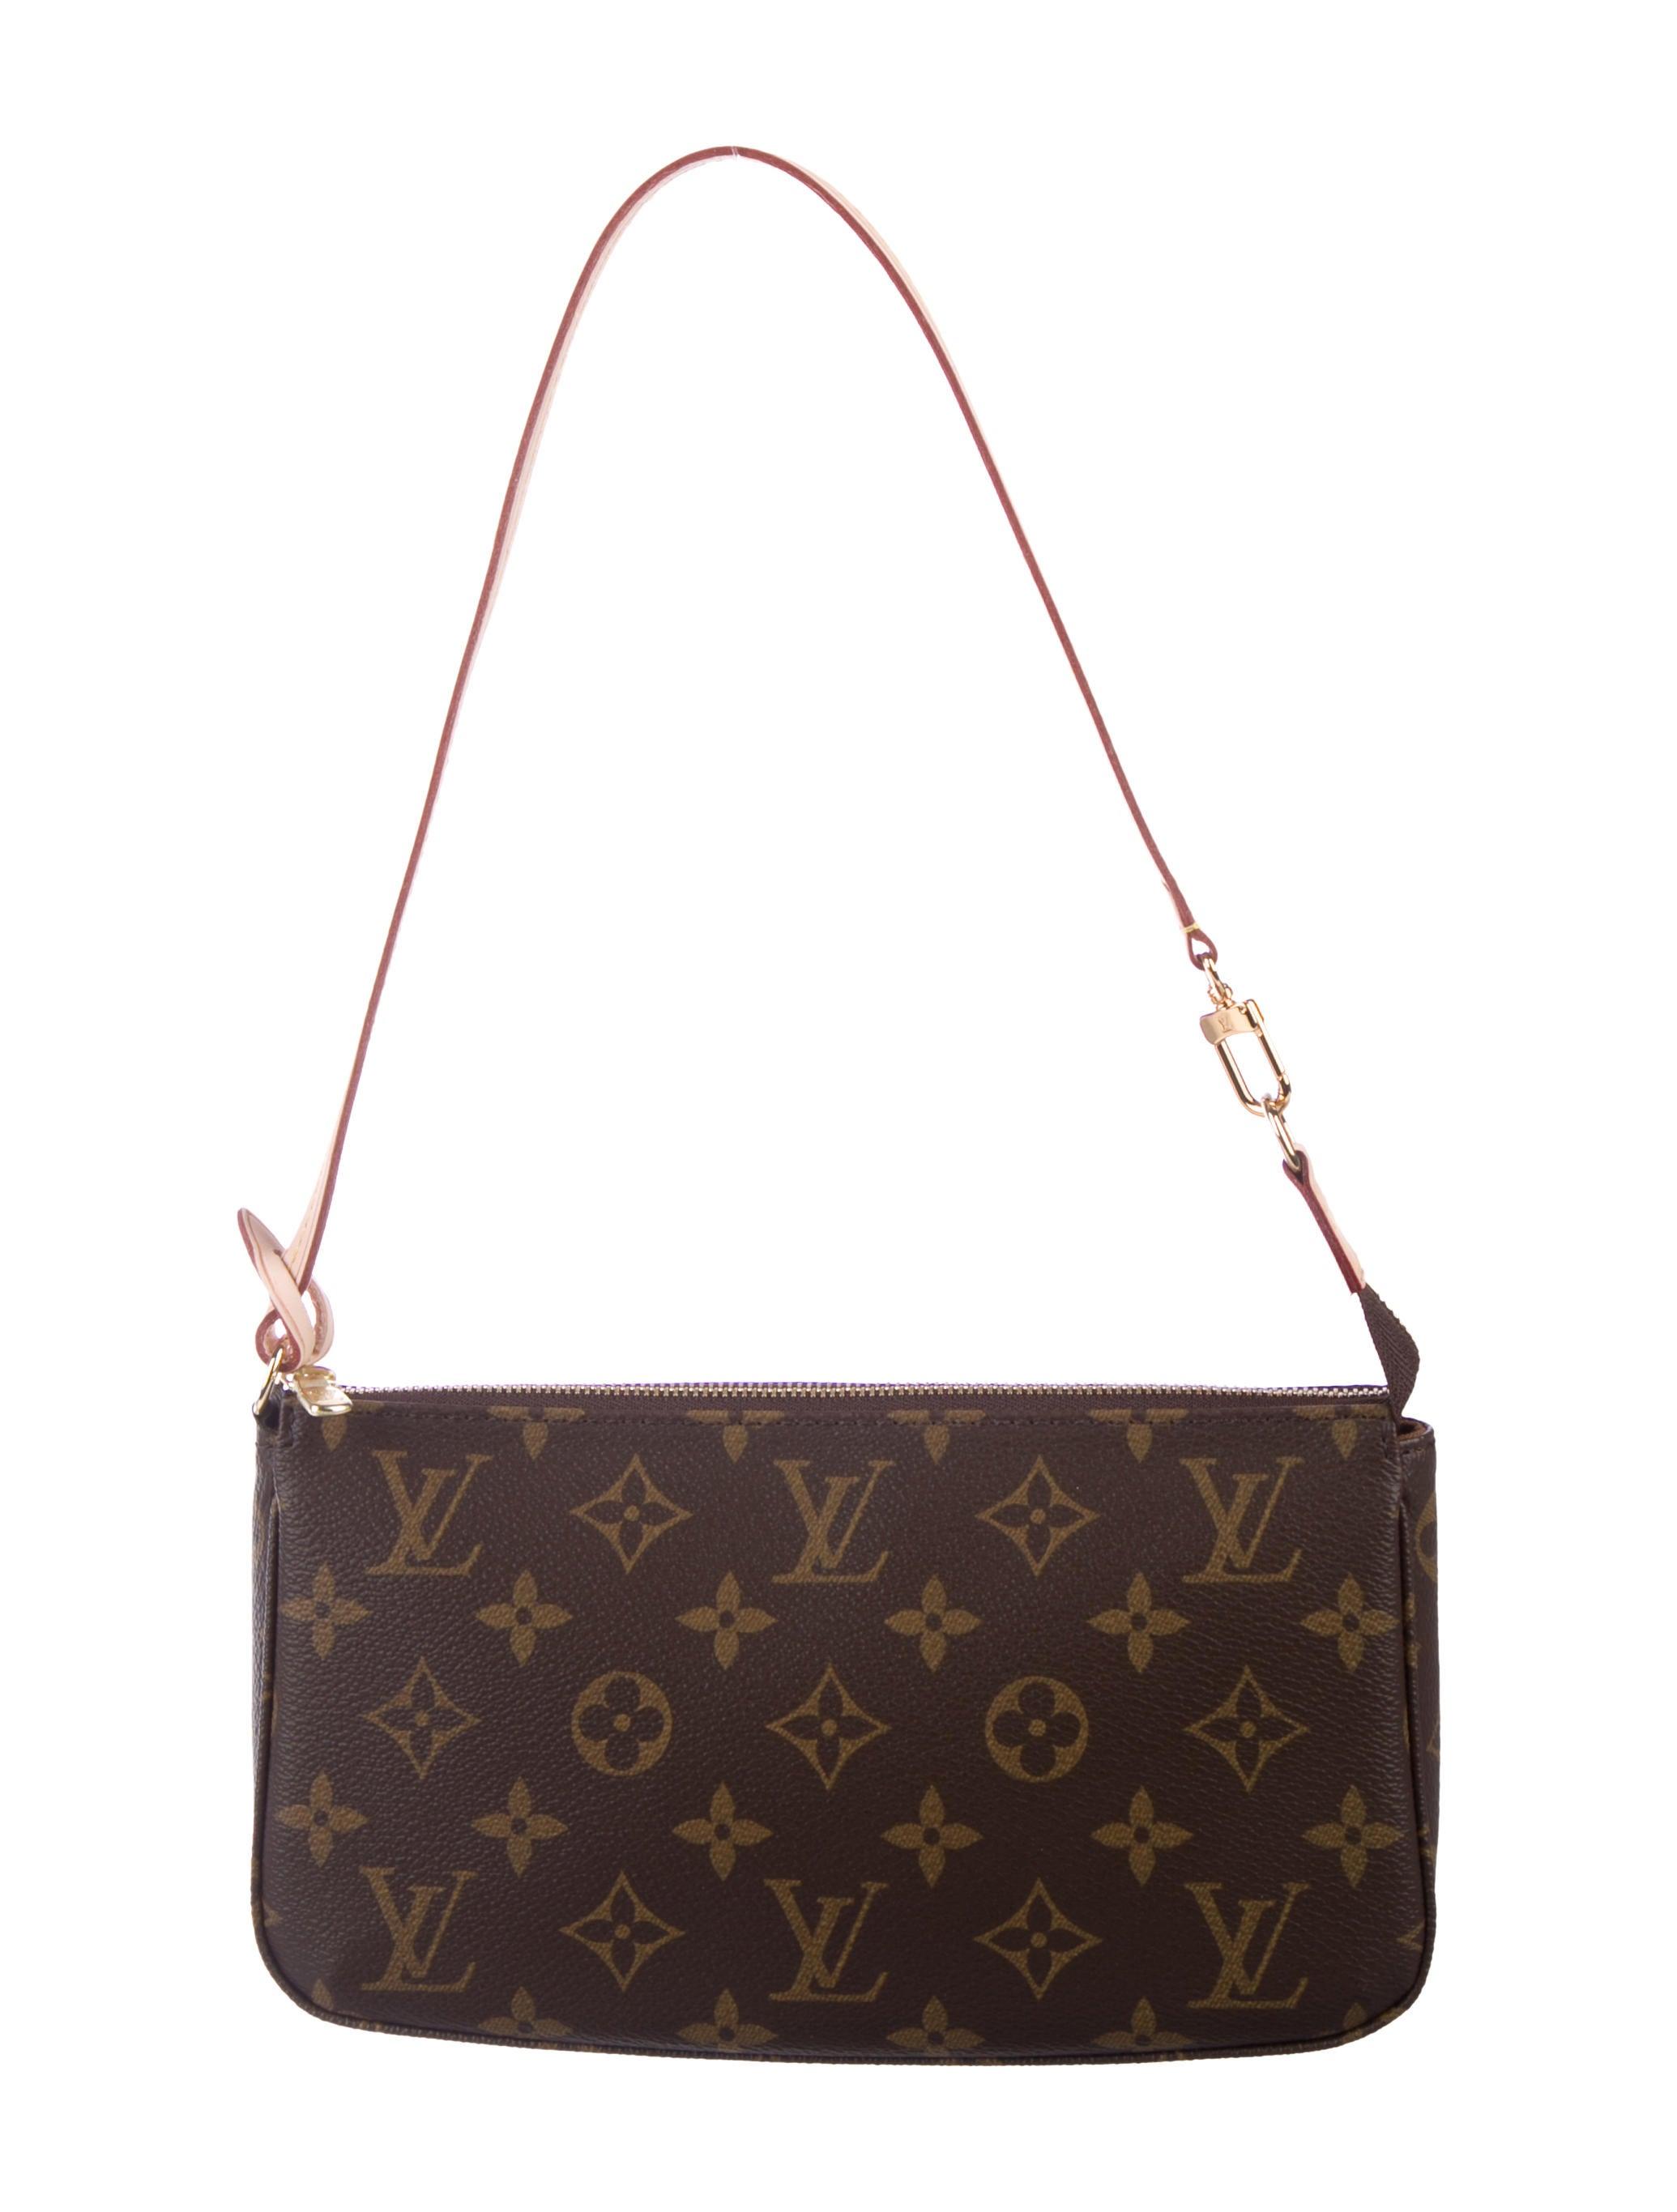 6c5ba0b38 Louis Vuitton Monogram Pochette Accessoires NM w/ Tags - Handbags ...